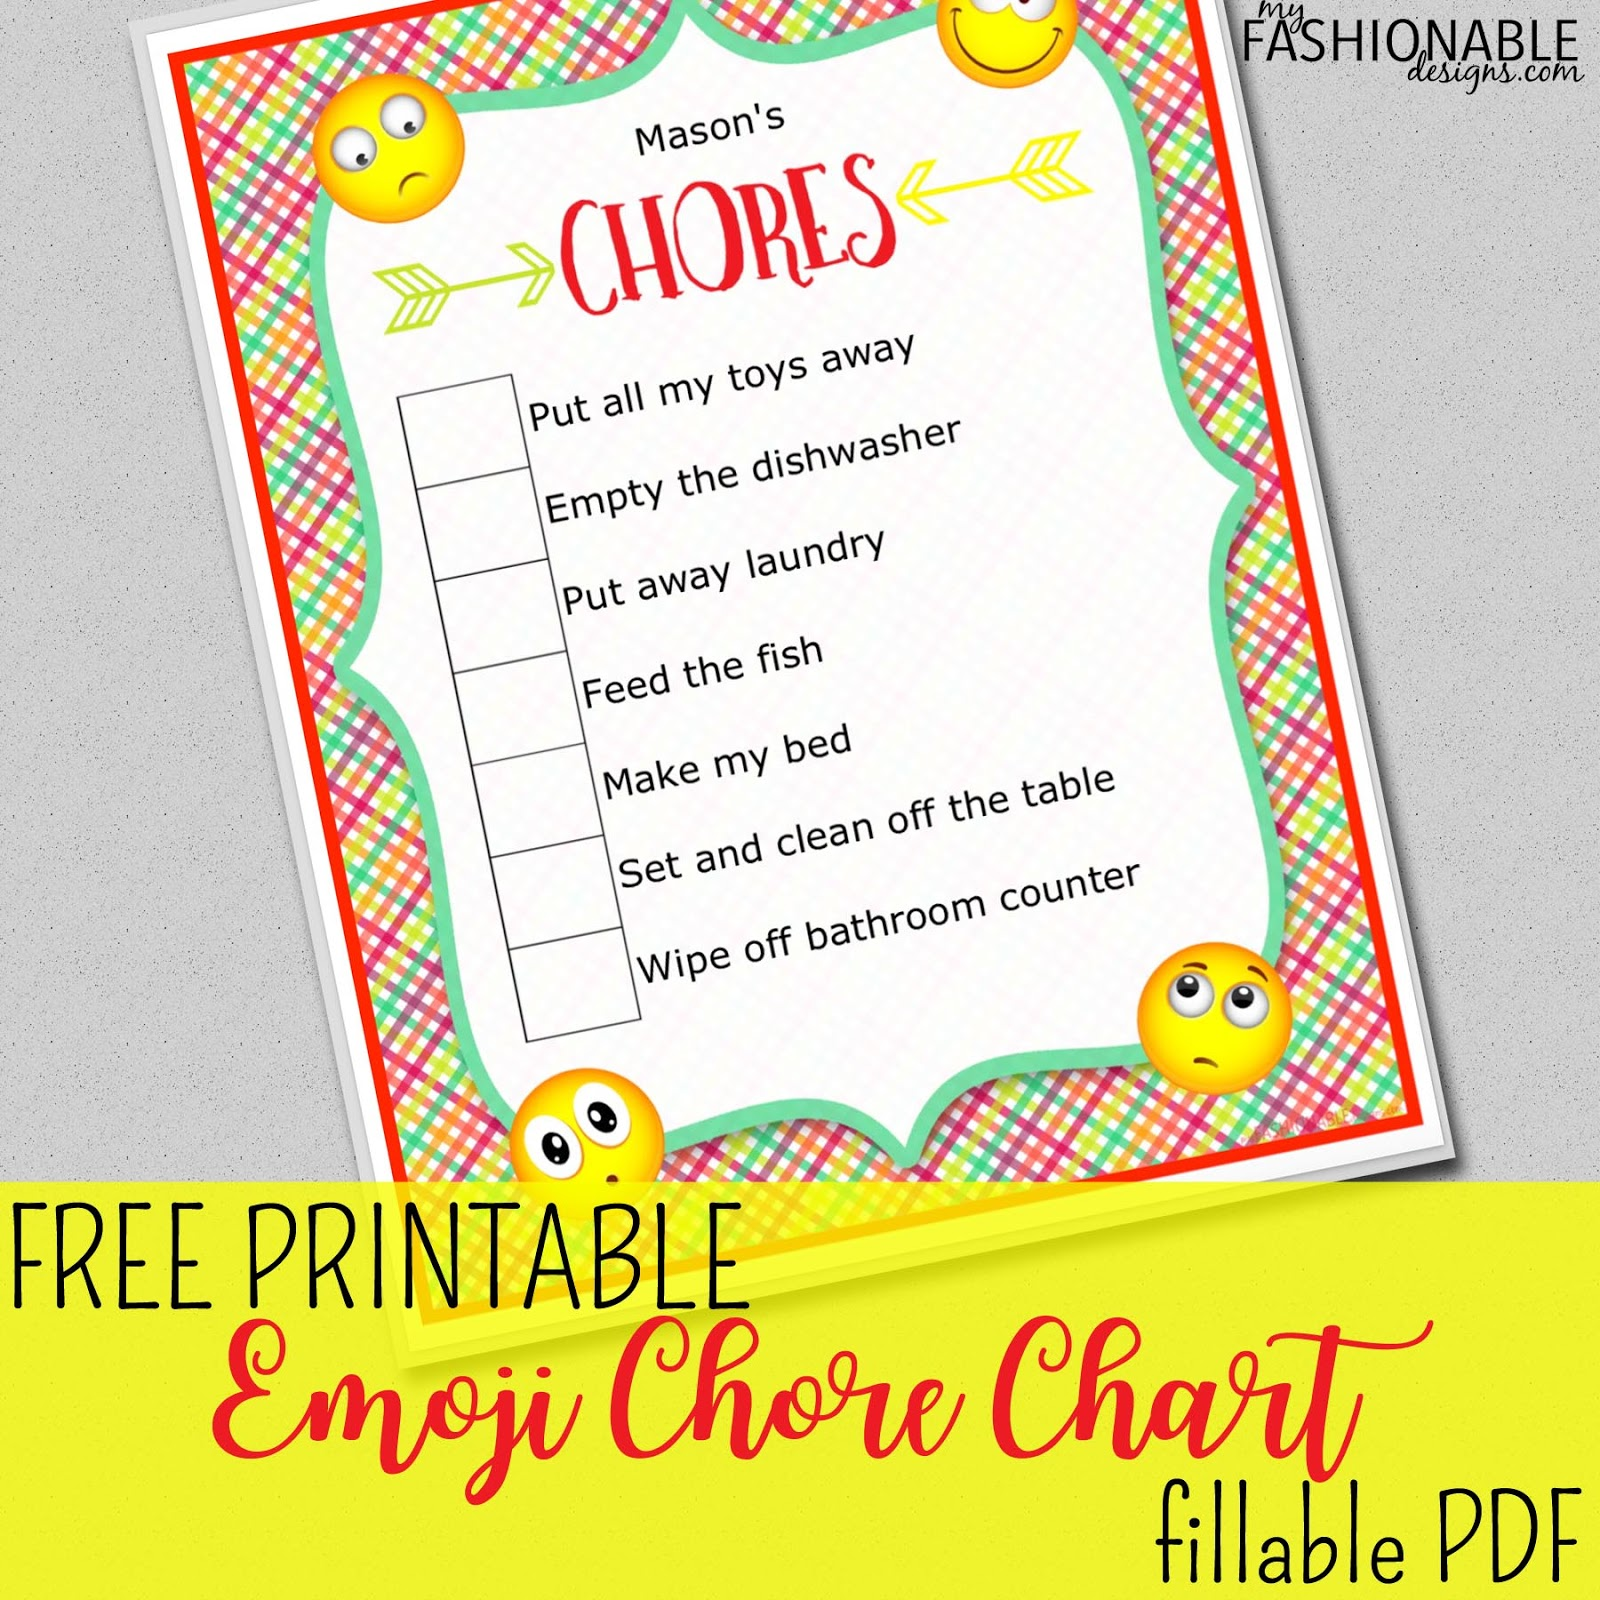 Free Printable Emoji Chore Chart Fillable PDF